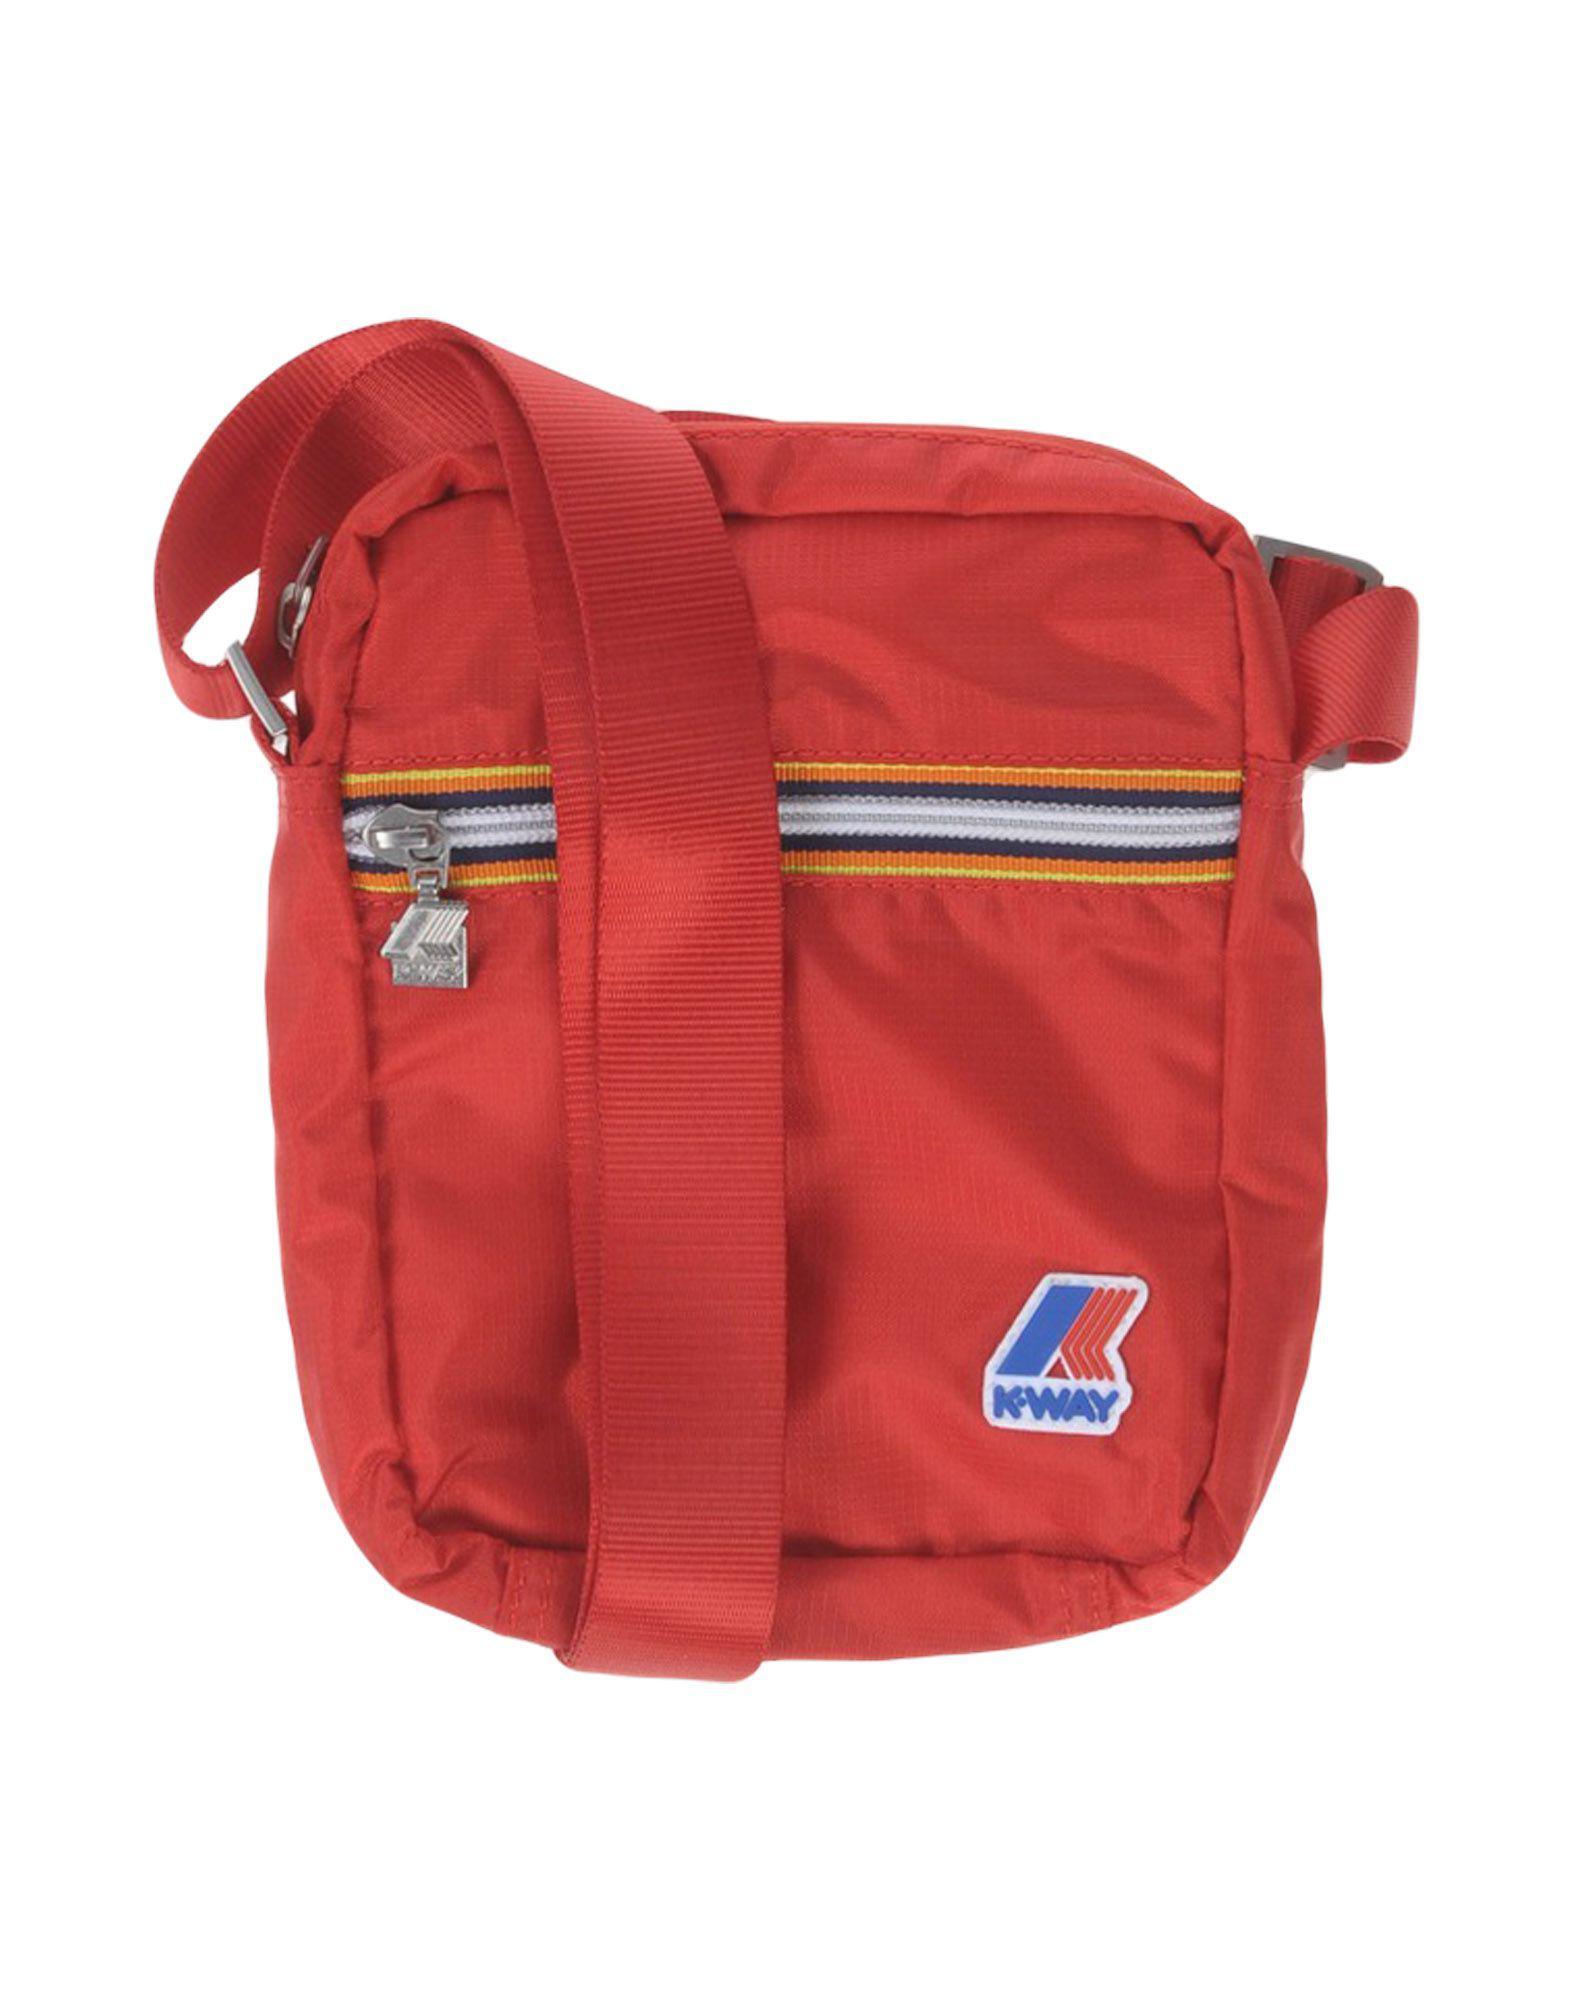 K-Way Cross-body Bag in Red for Men - Lyst f073aa72a29f6